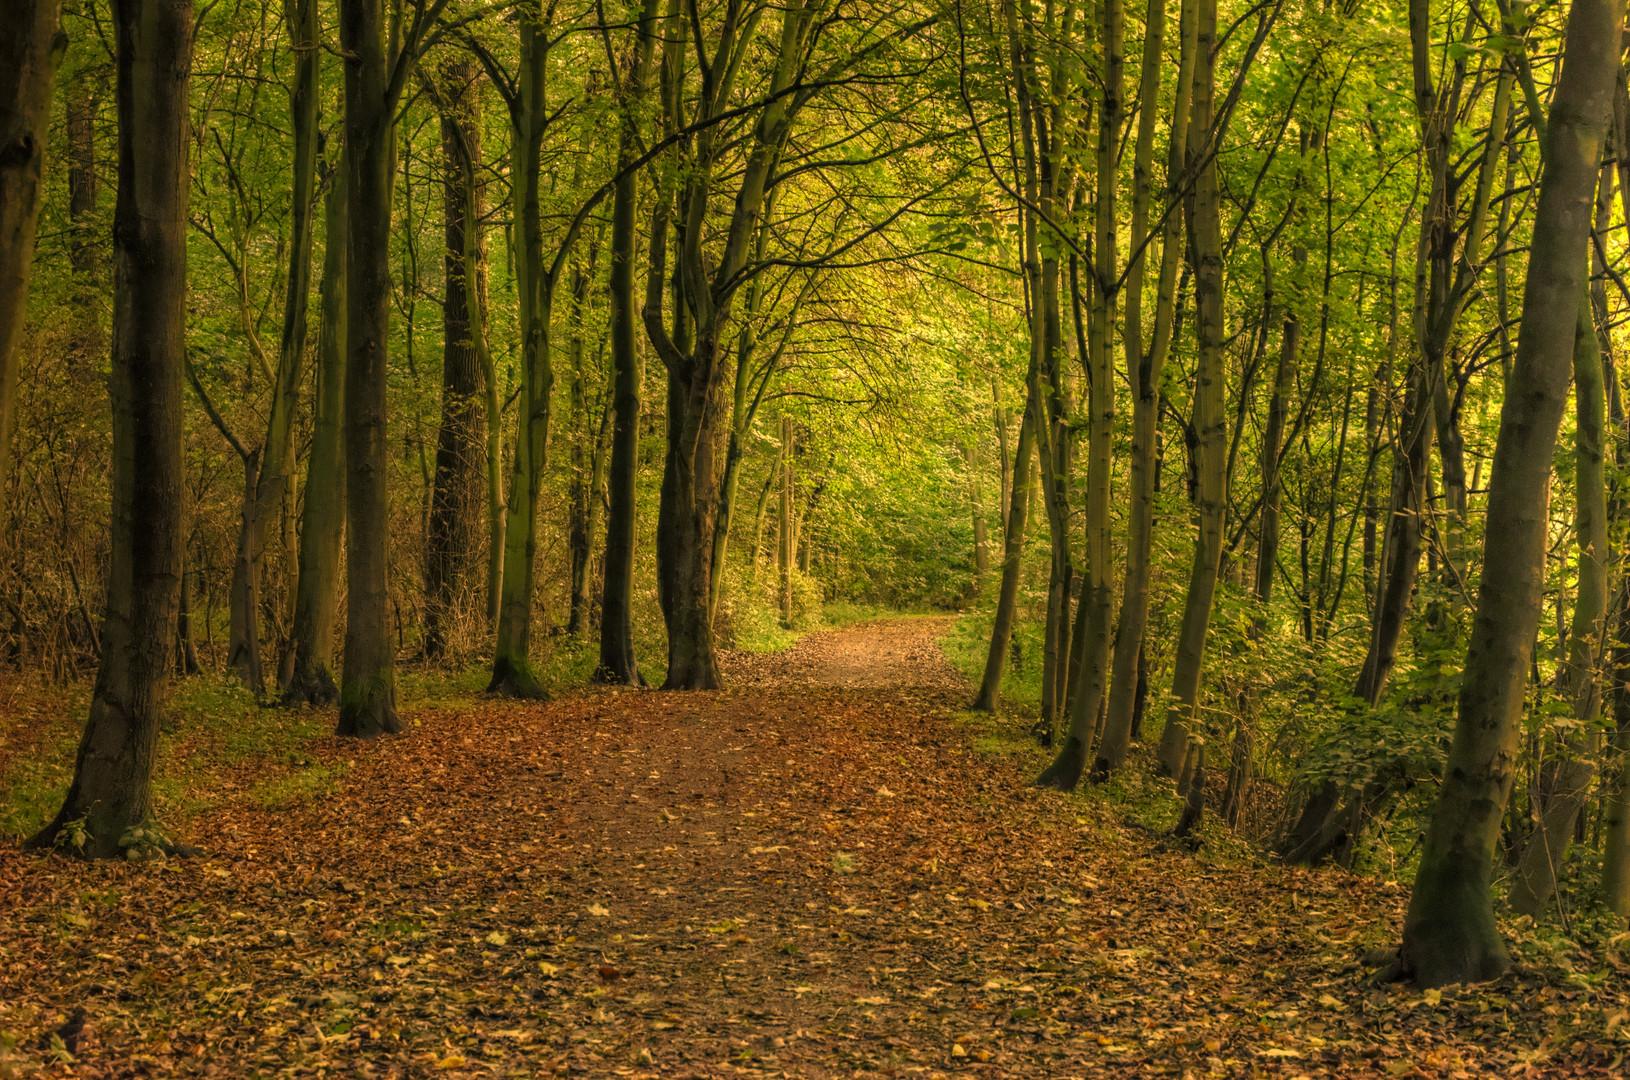 mein sherwood forest